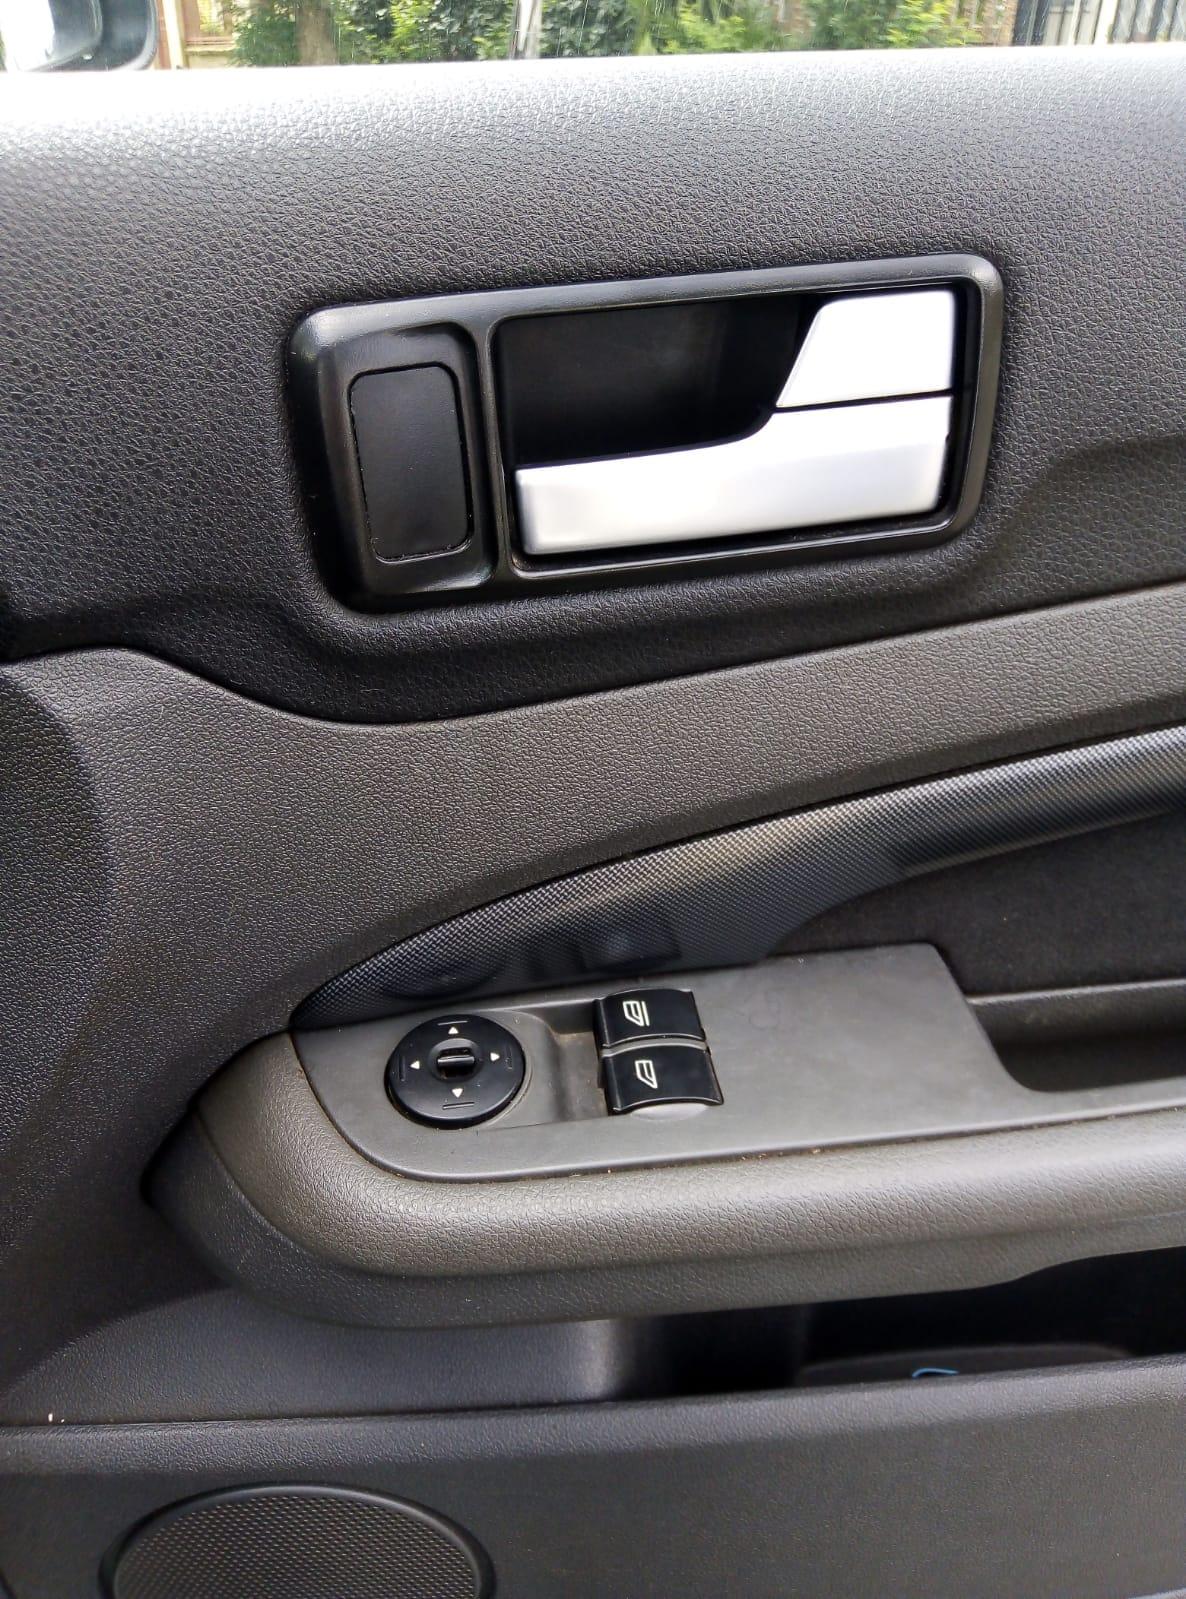 2008 Ford Focus hatch 5-door FOCUS 2.5 ST 5Dr